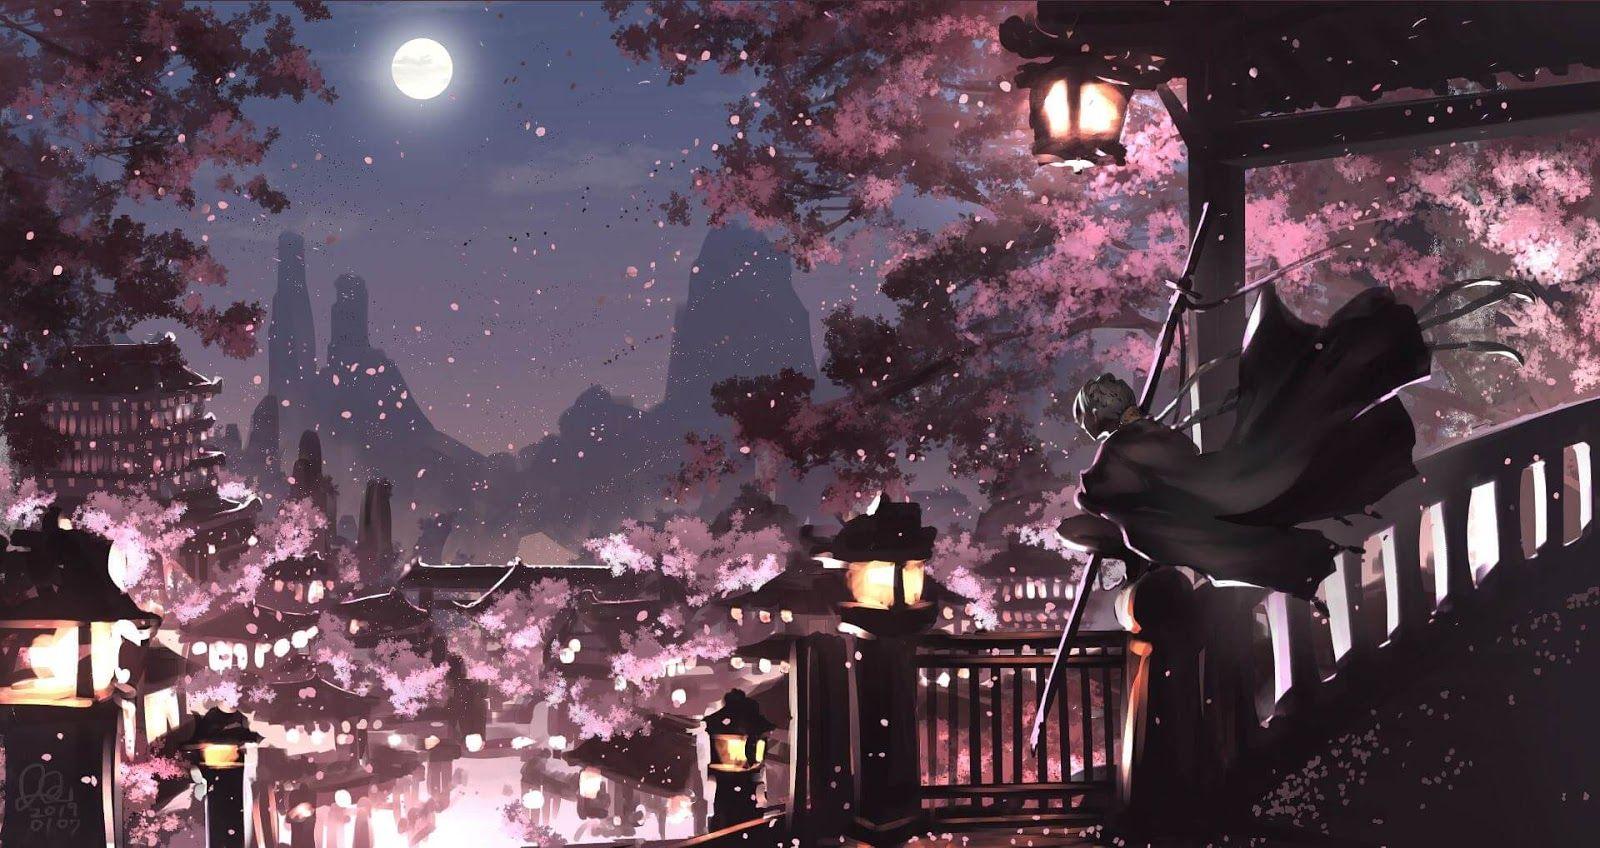 Night City Of Sakura Wallpaper Engine Anime Night City Anime Wallpaper Cute Laptop Wallpaper Anime city night wallpaper 4k